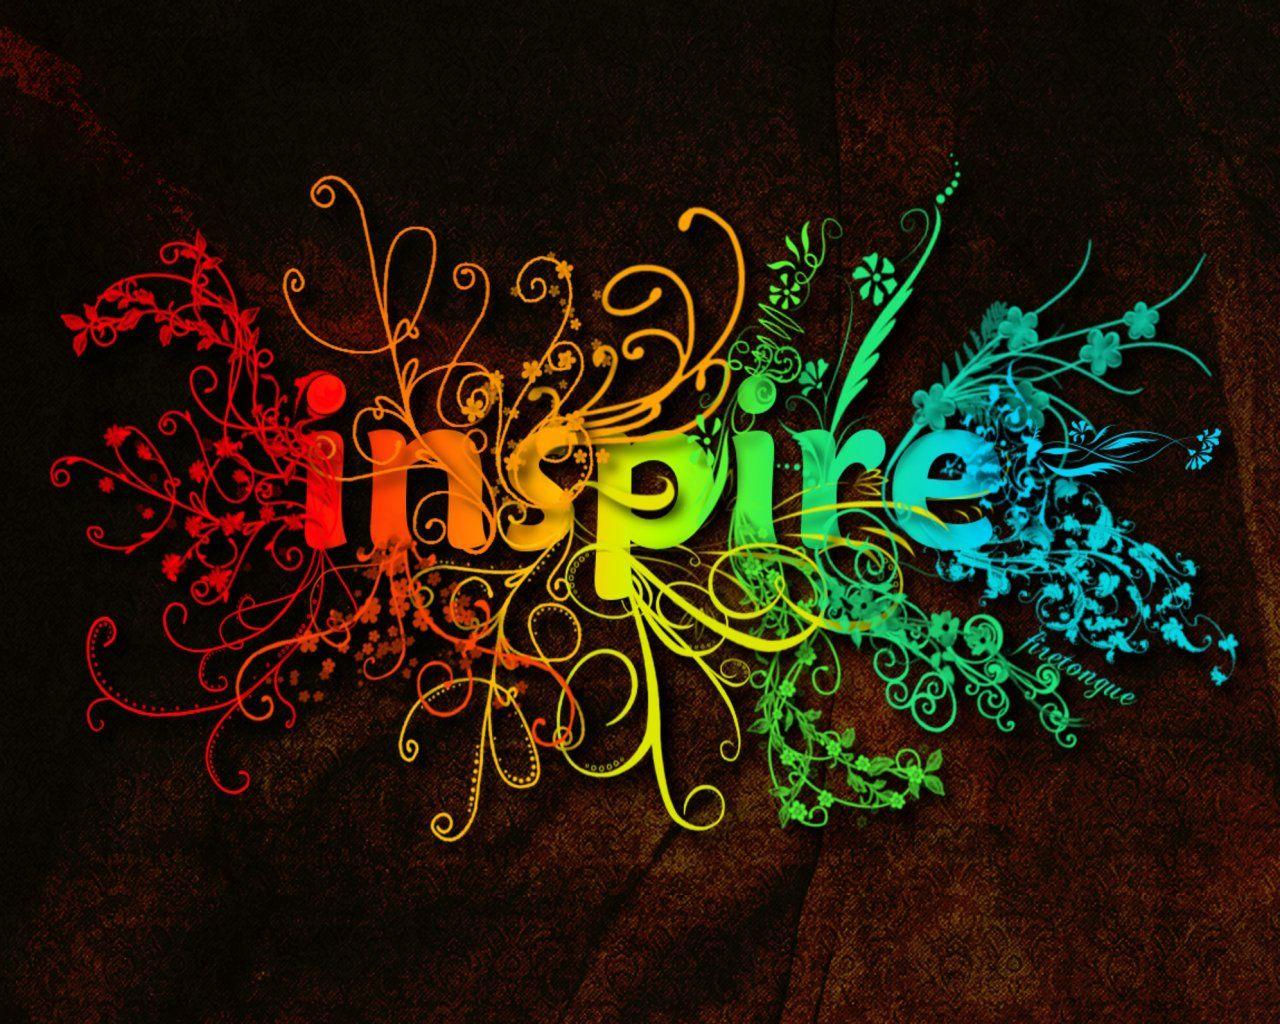 3d inspirational wallpapers cherice varner pinterest 3d inspirational wallpapers voltagebd Images